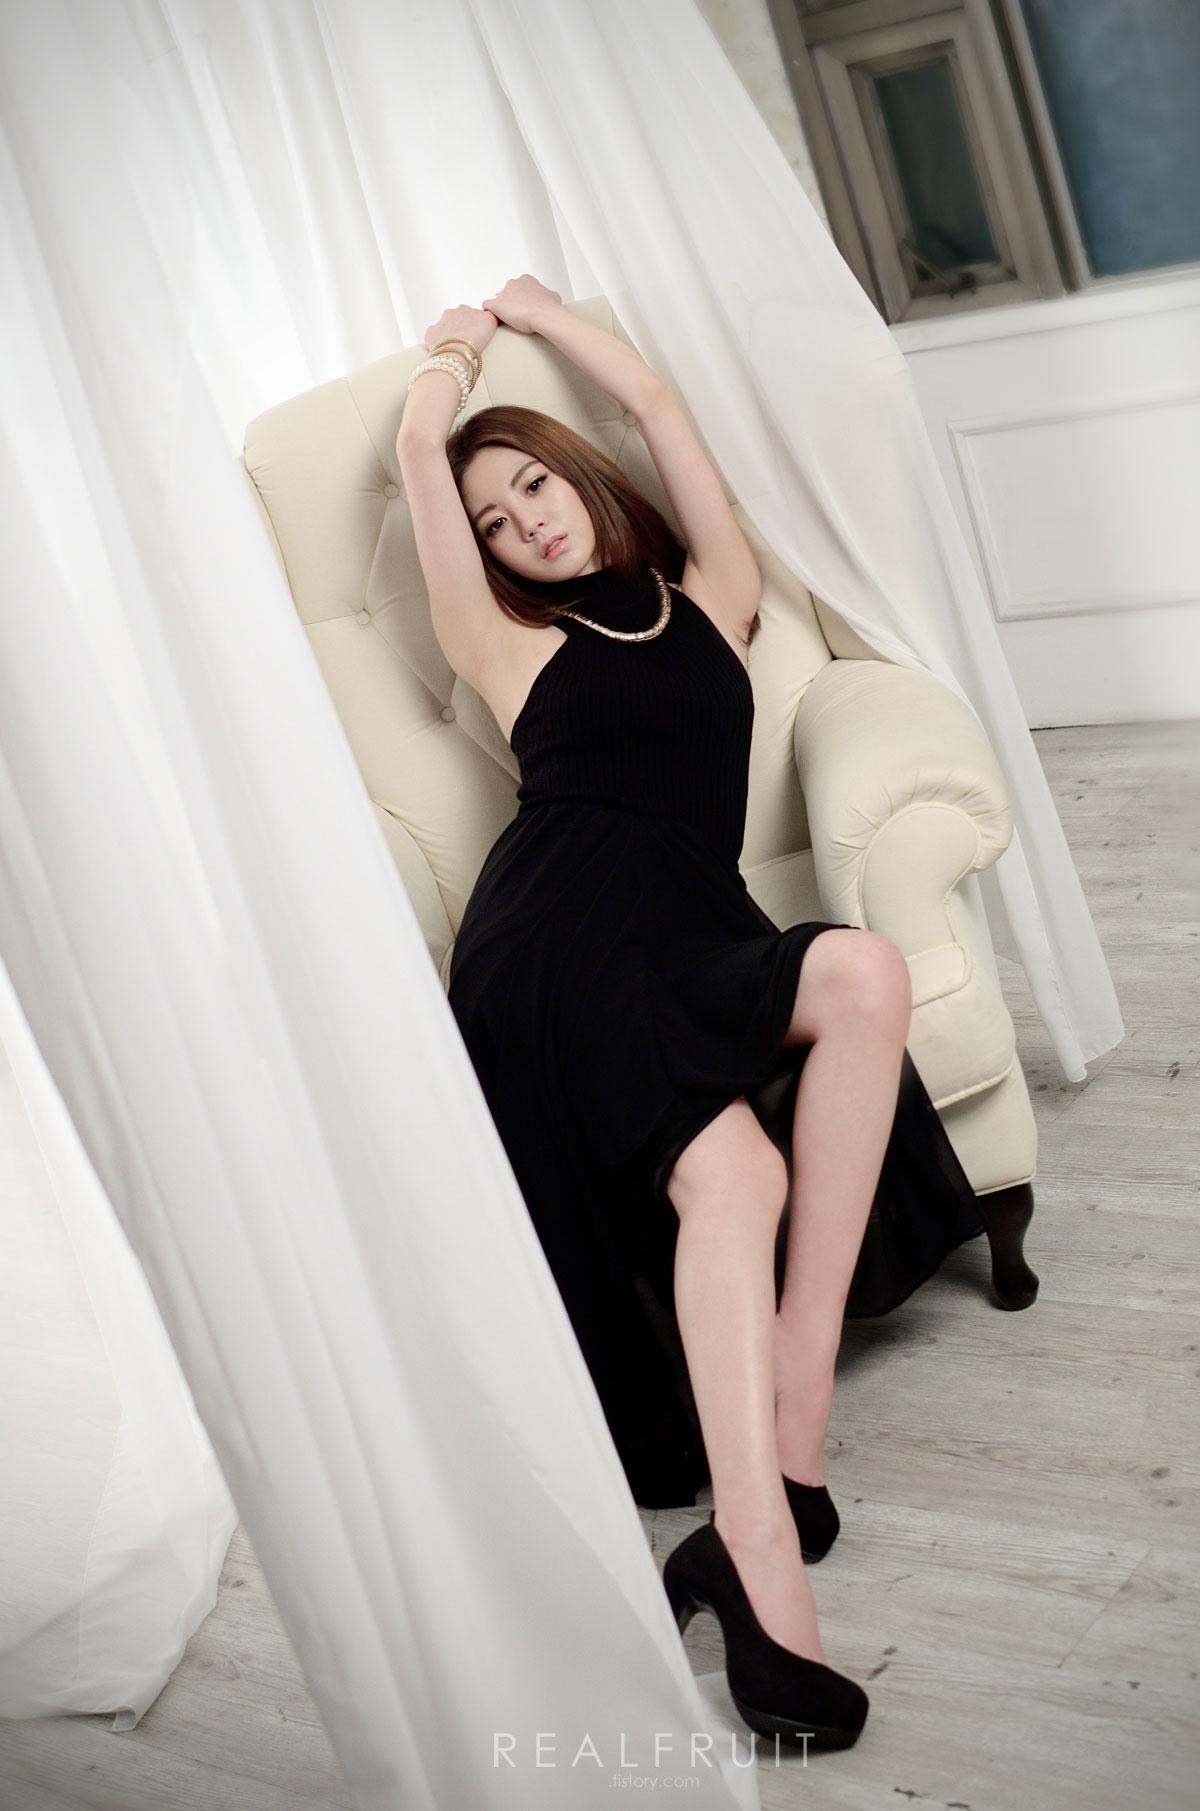 Korean model Chae Eun studio photoshoot